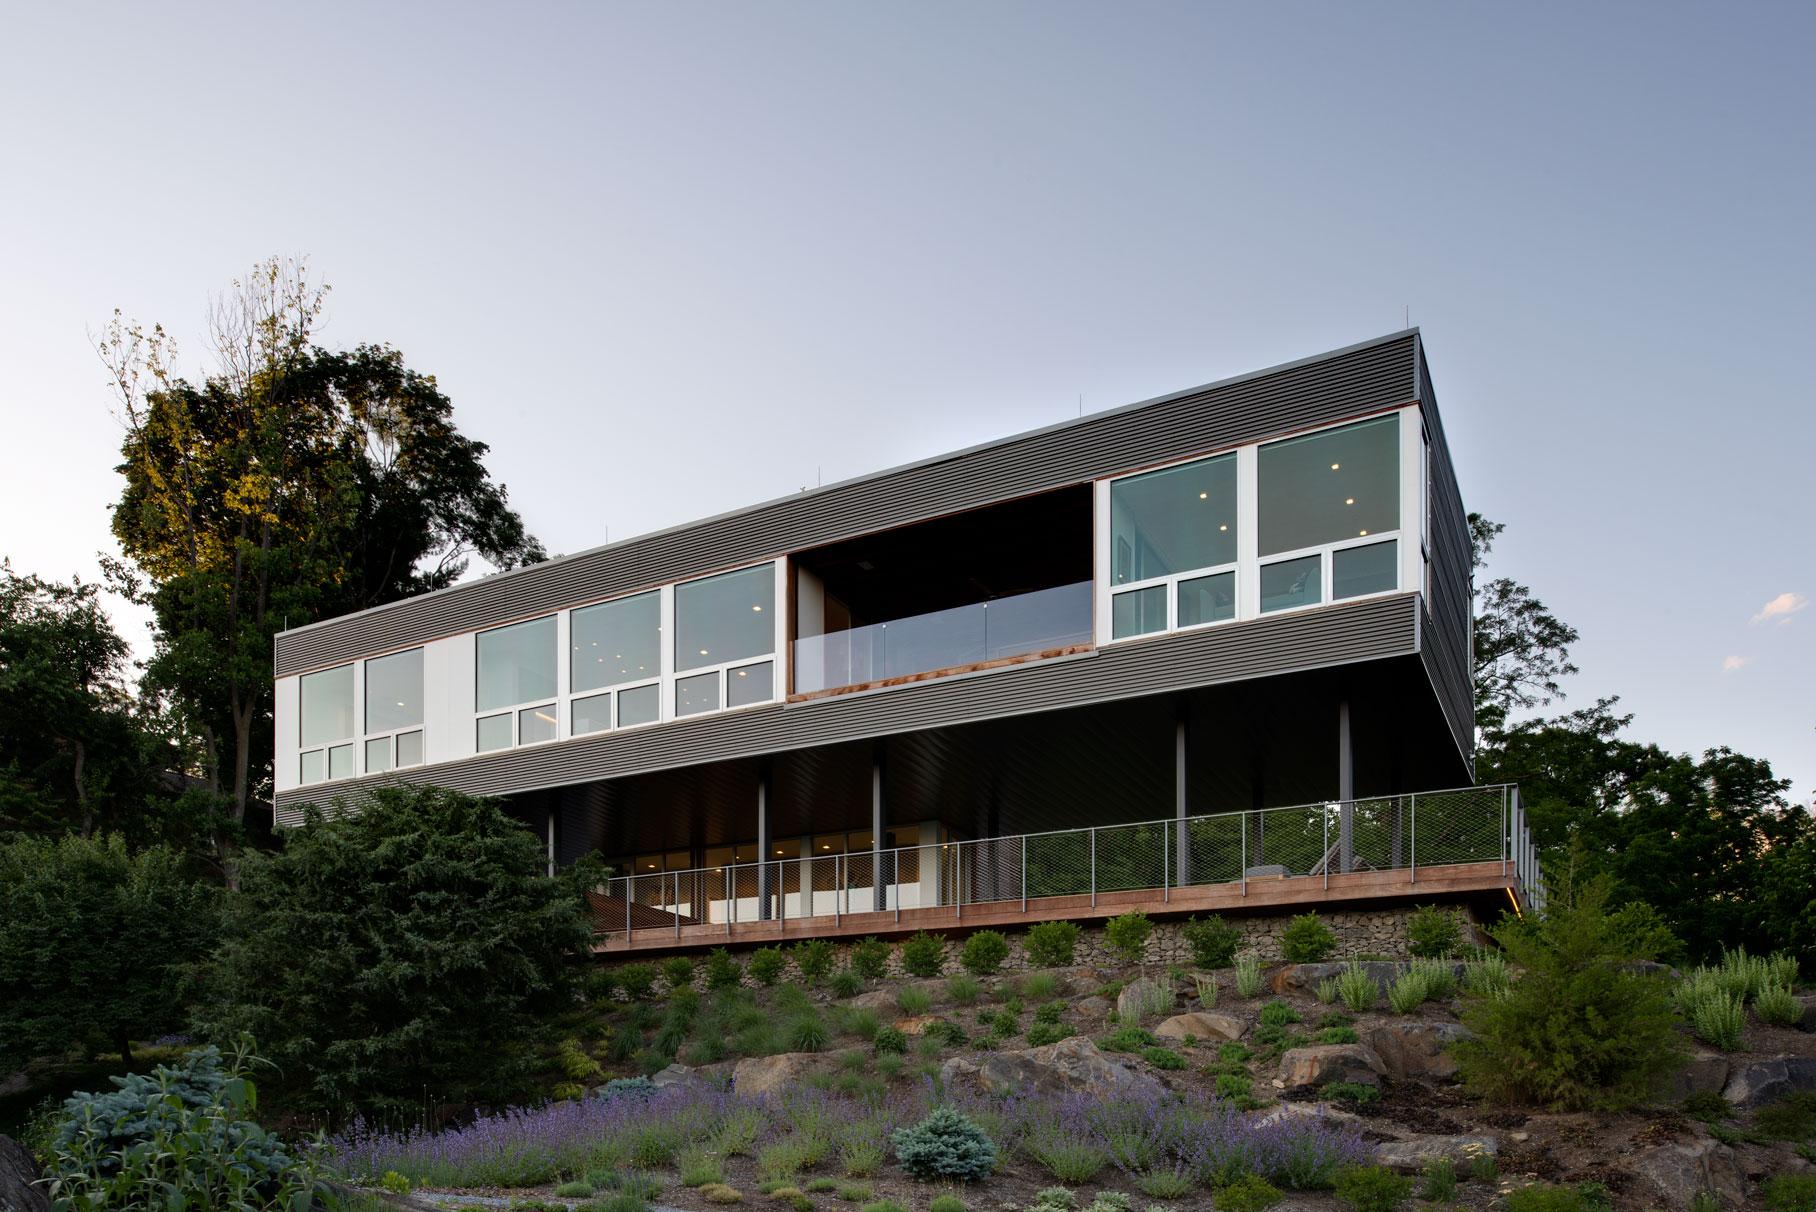 18-res4-resolution-4-architecture-modern-residential-hudson-river-house-crotononhudson-newyork-exterior-facade-elevation-landscape-dusk.jpg